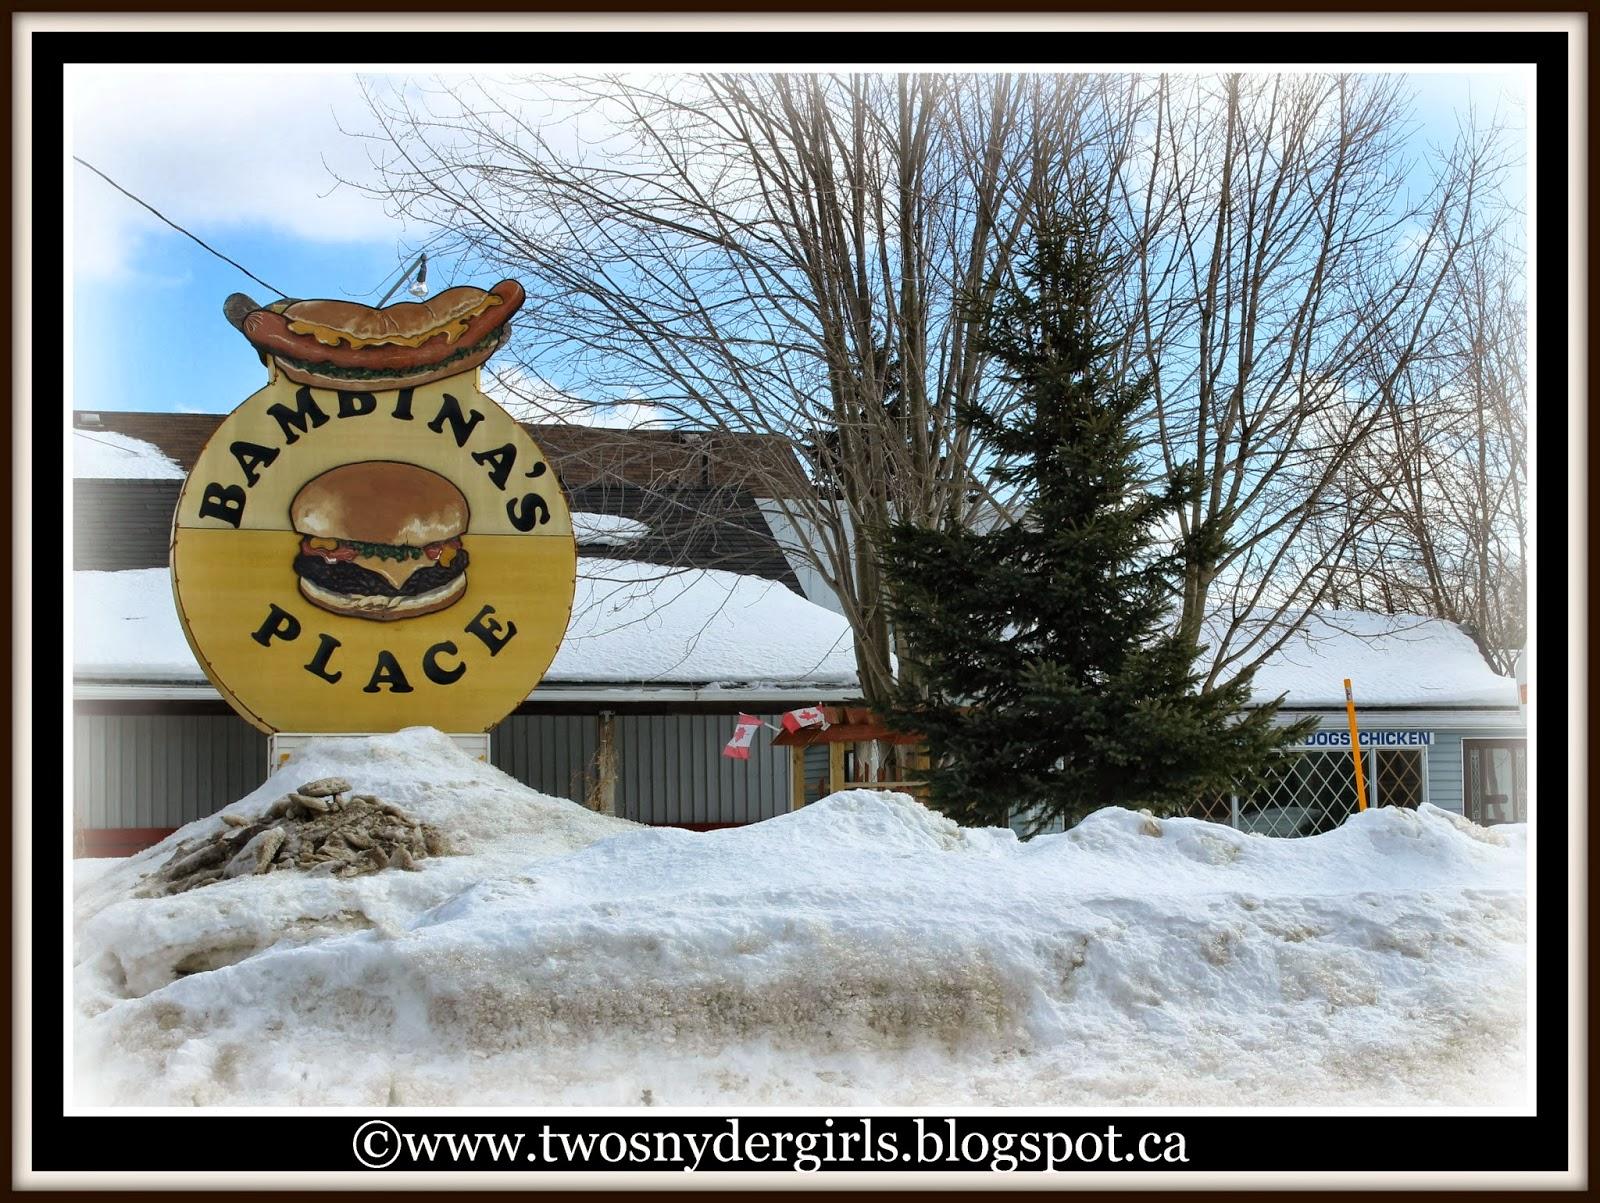 Ice Cream store closed for winter